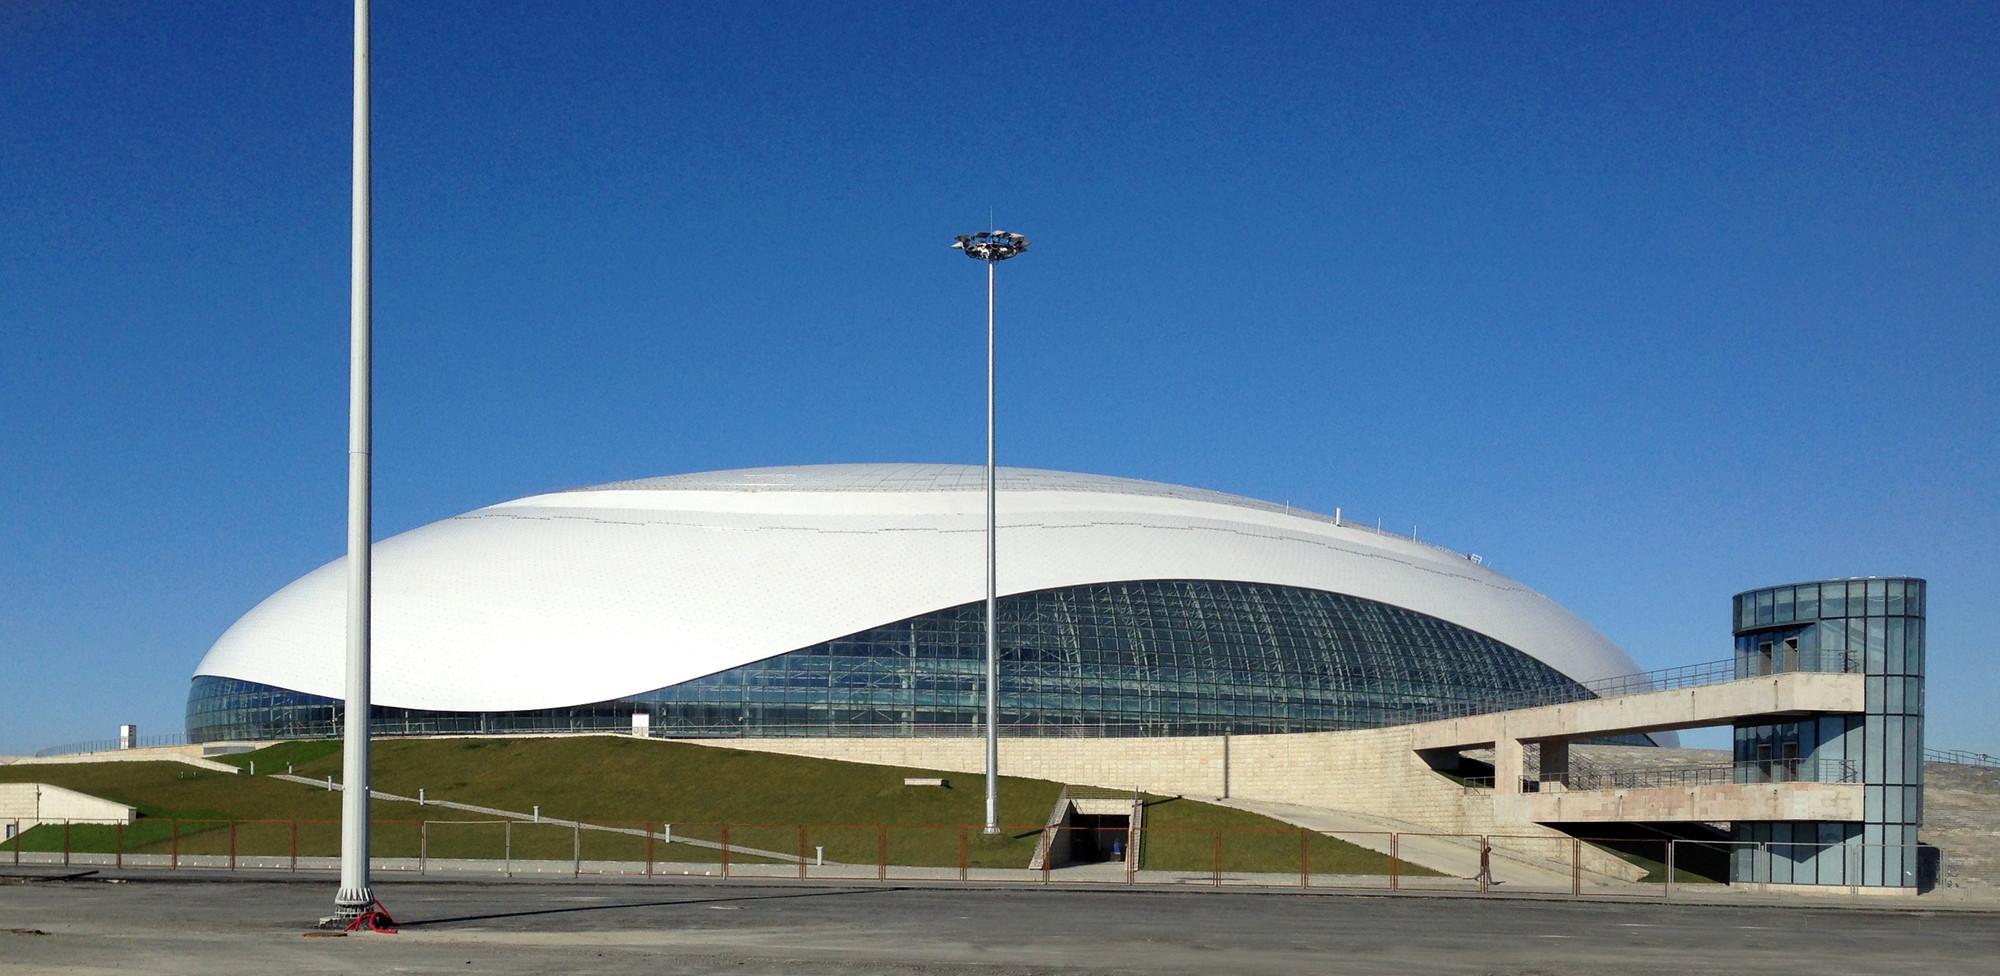 Ice Dome Bolshoy Sic Mostovik Archdaily